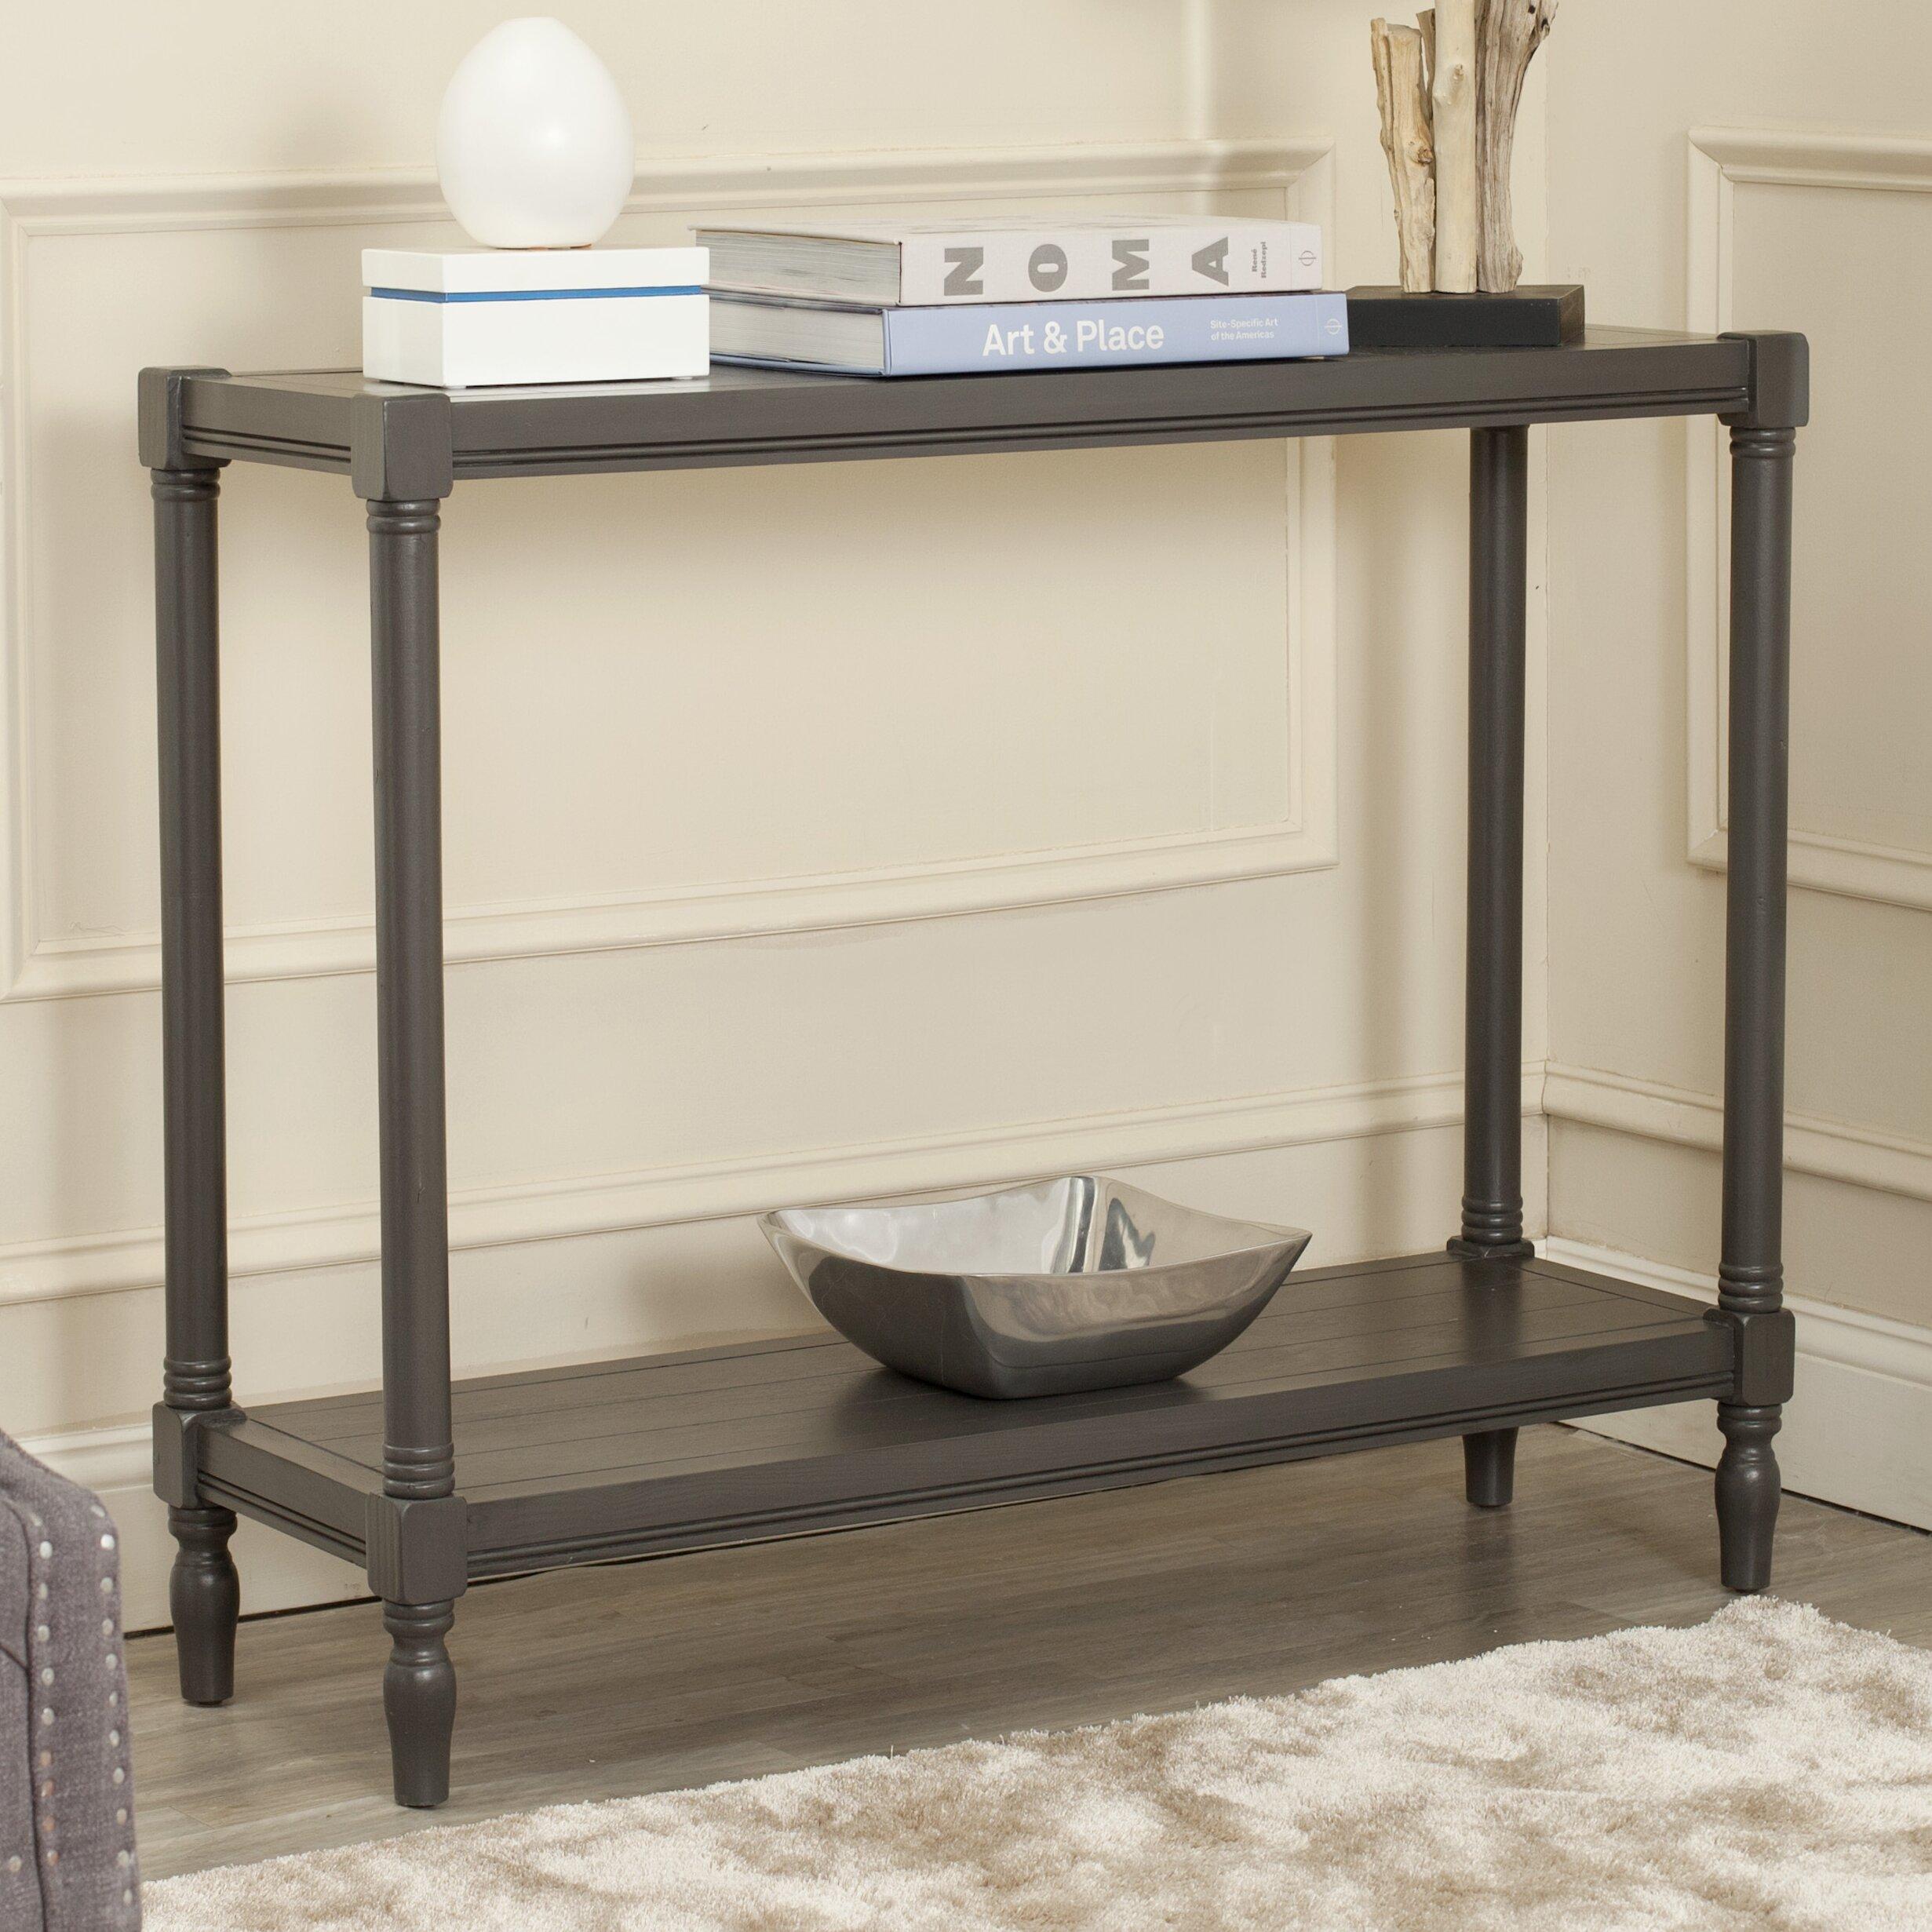 safavieh denton console table reviews wayfair uk. Black Bedroom Furniture Sets. Home Design Ideas